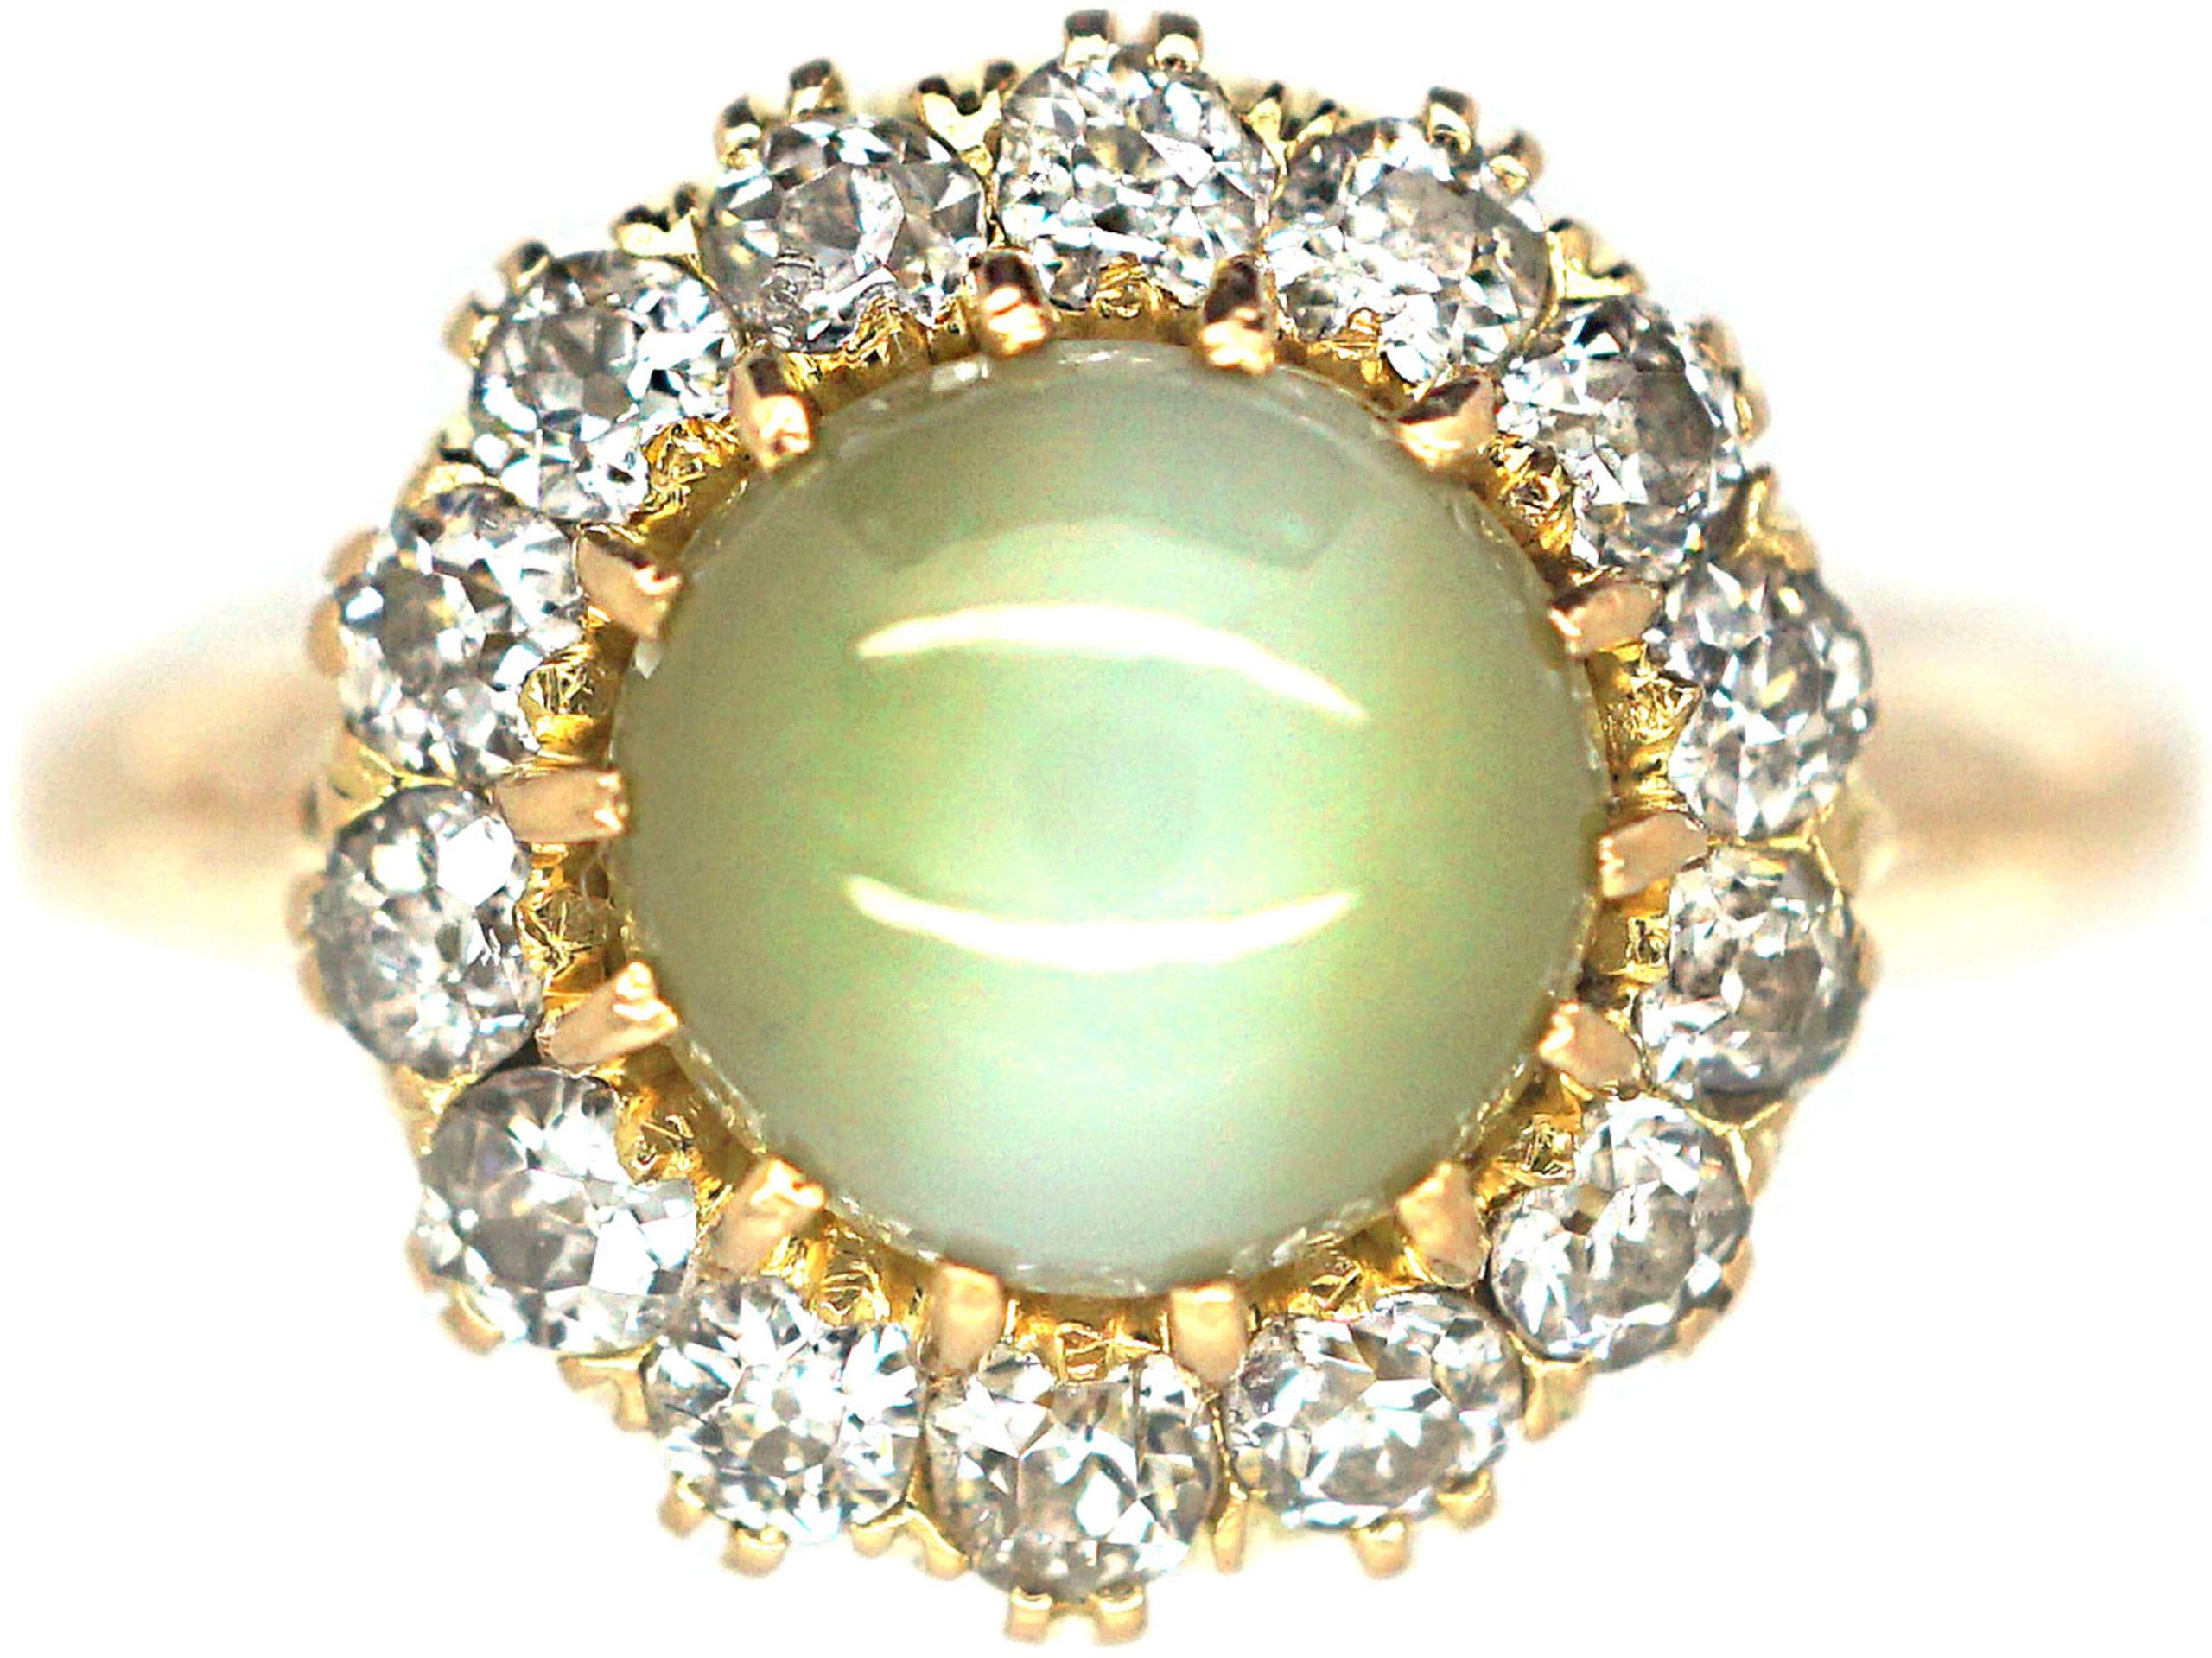 Edwardian 18ct Gold, Cat's Eye Chrysoberyl & Diamond Cluster Ring